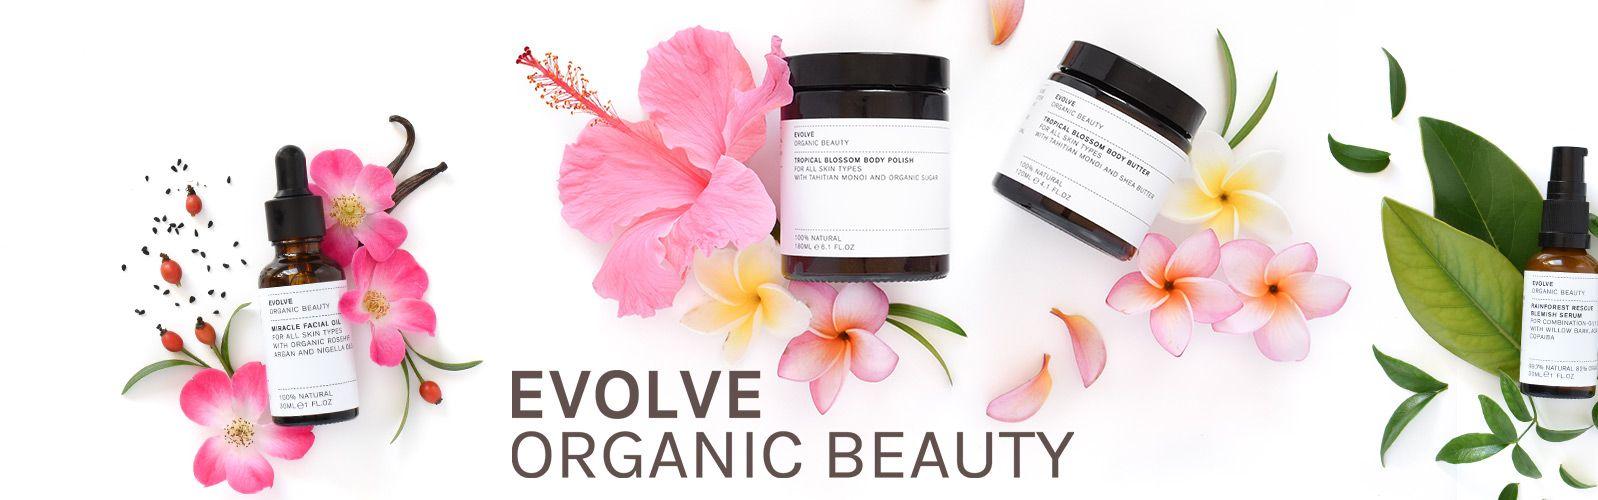 EVOLVE ORGANIC BEAUTY Hautpflege